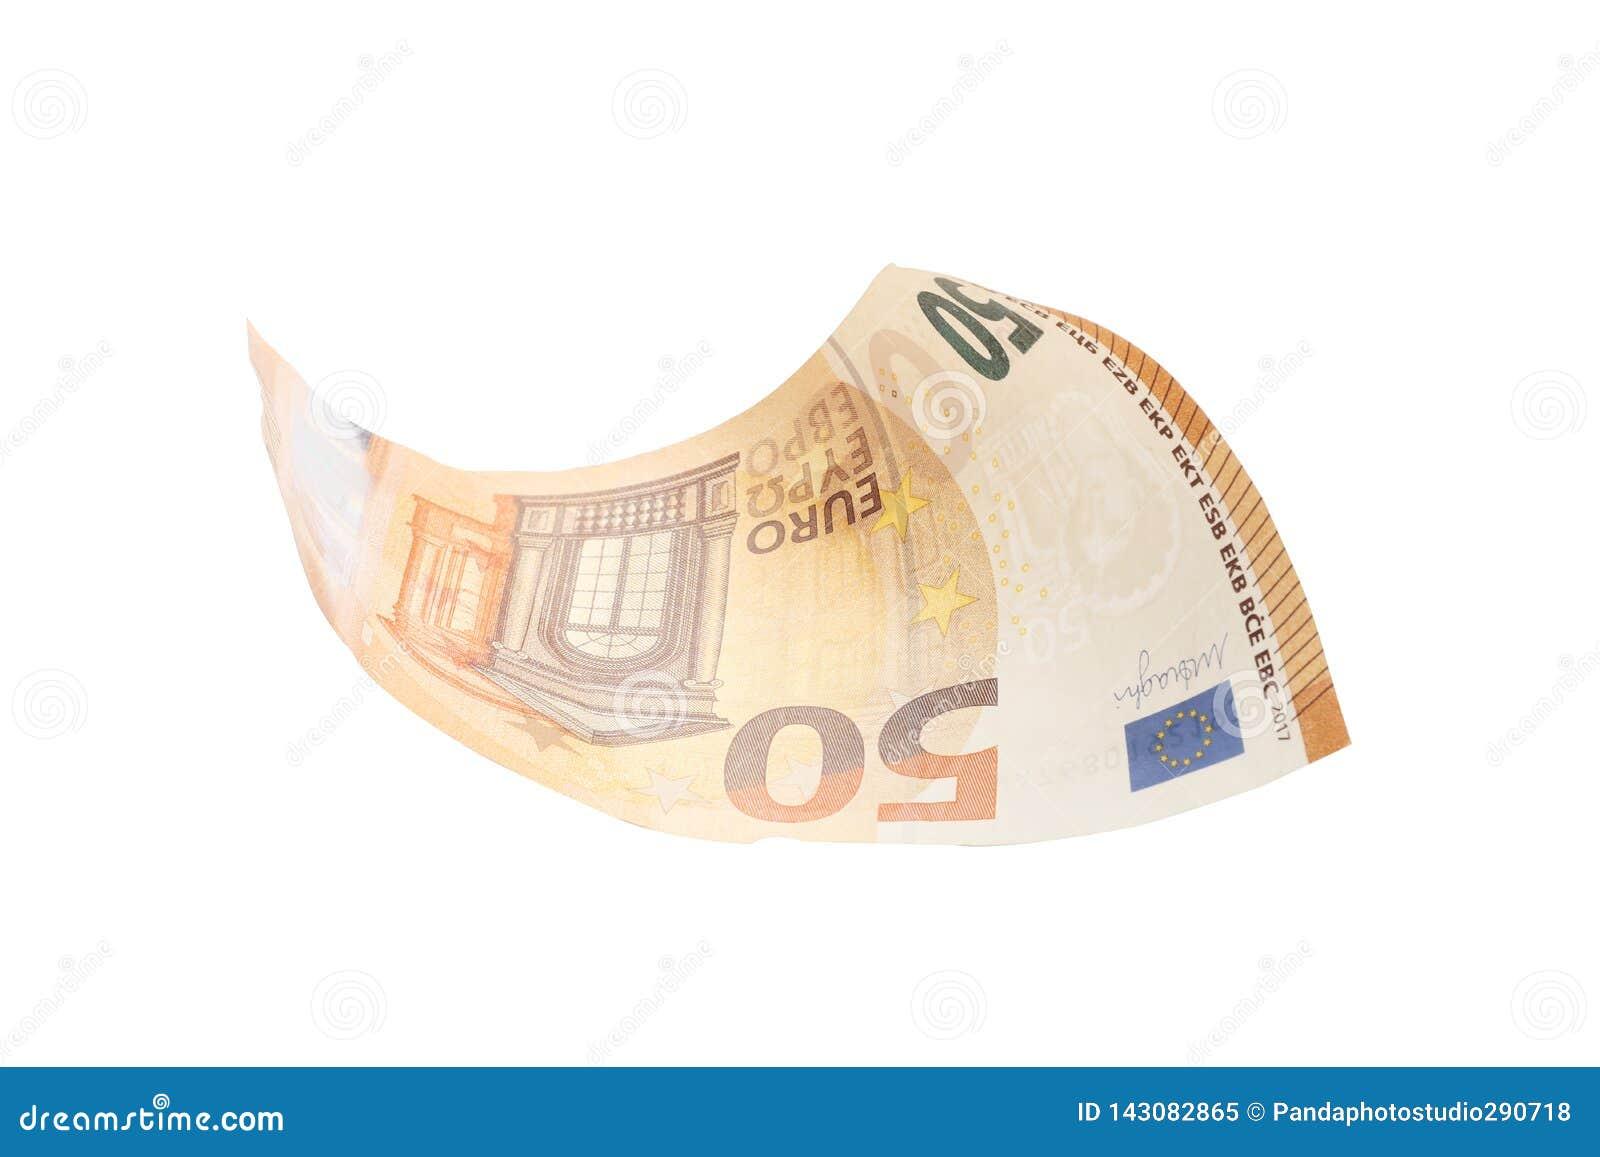 Fifty euro isolated on white background, finance, business, economy